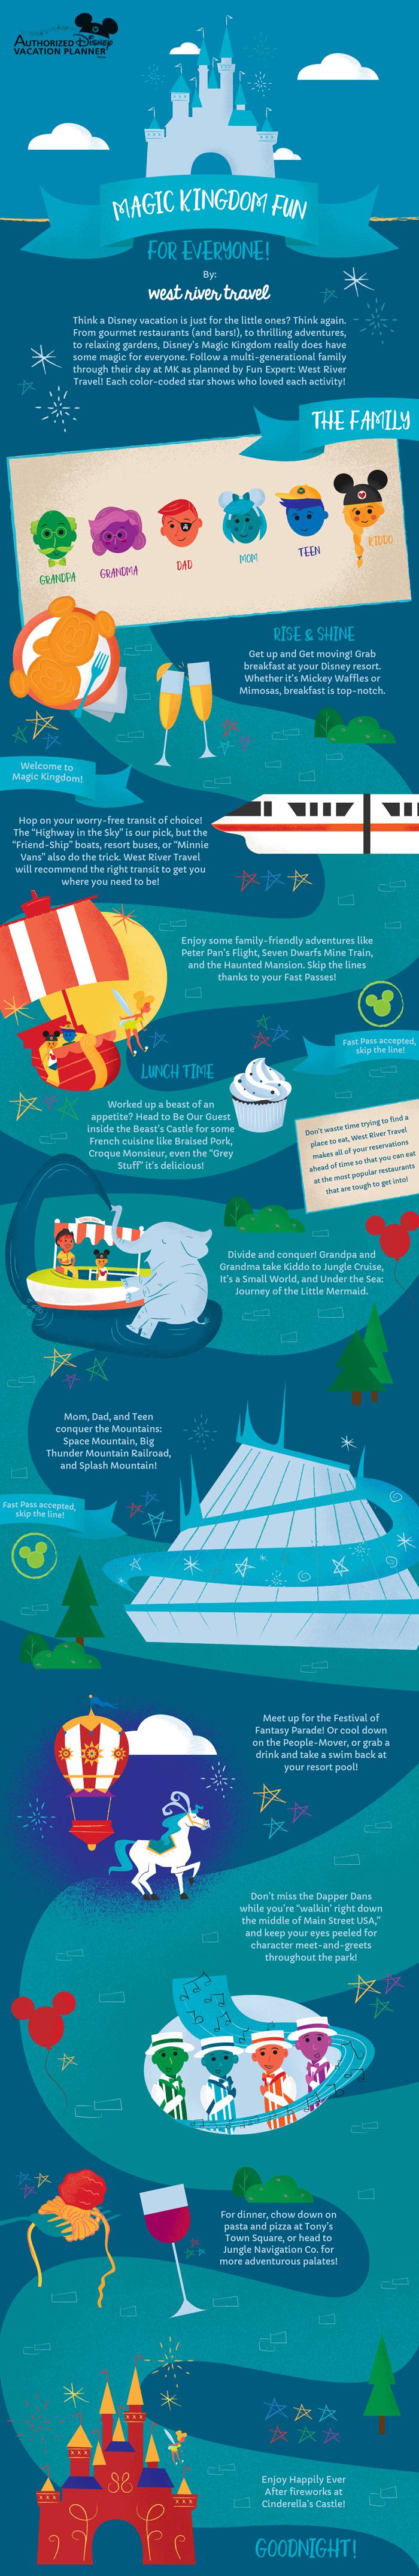 disney world illustrated infographic magic kingdom